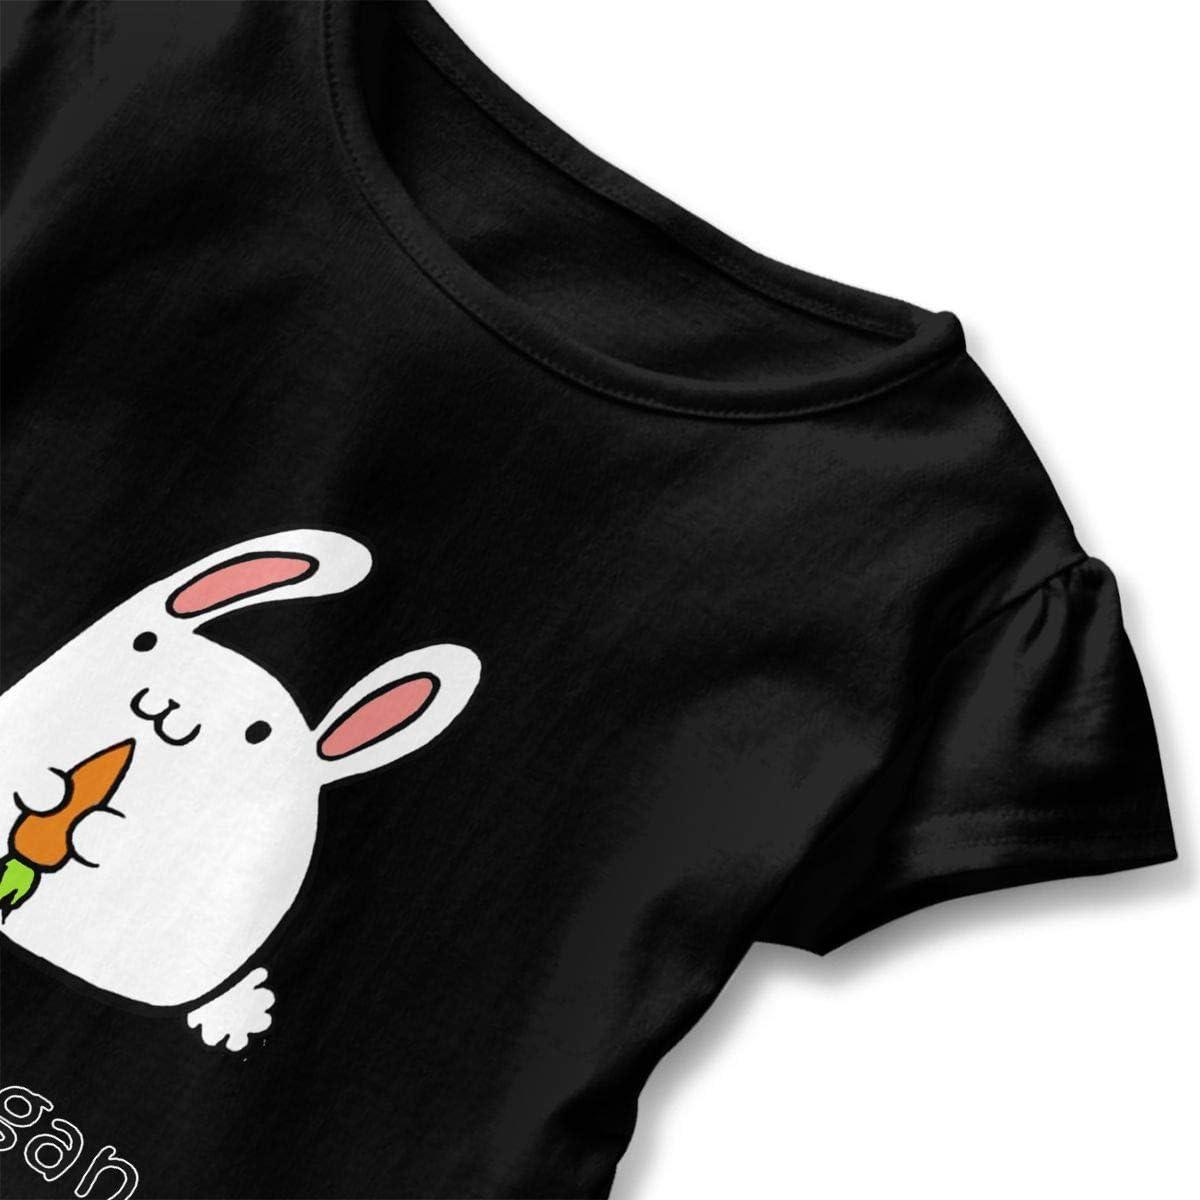 Be A Vegan Like Rabbit Baby Girls Fashion Ruffle Top T-Shirt Flounces Dress Toddler Girls Summer Tops